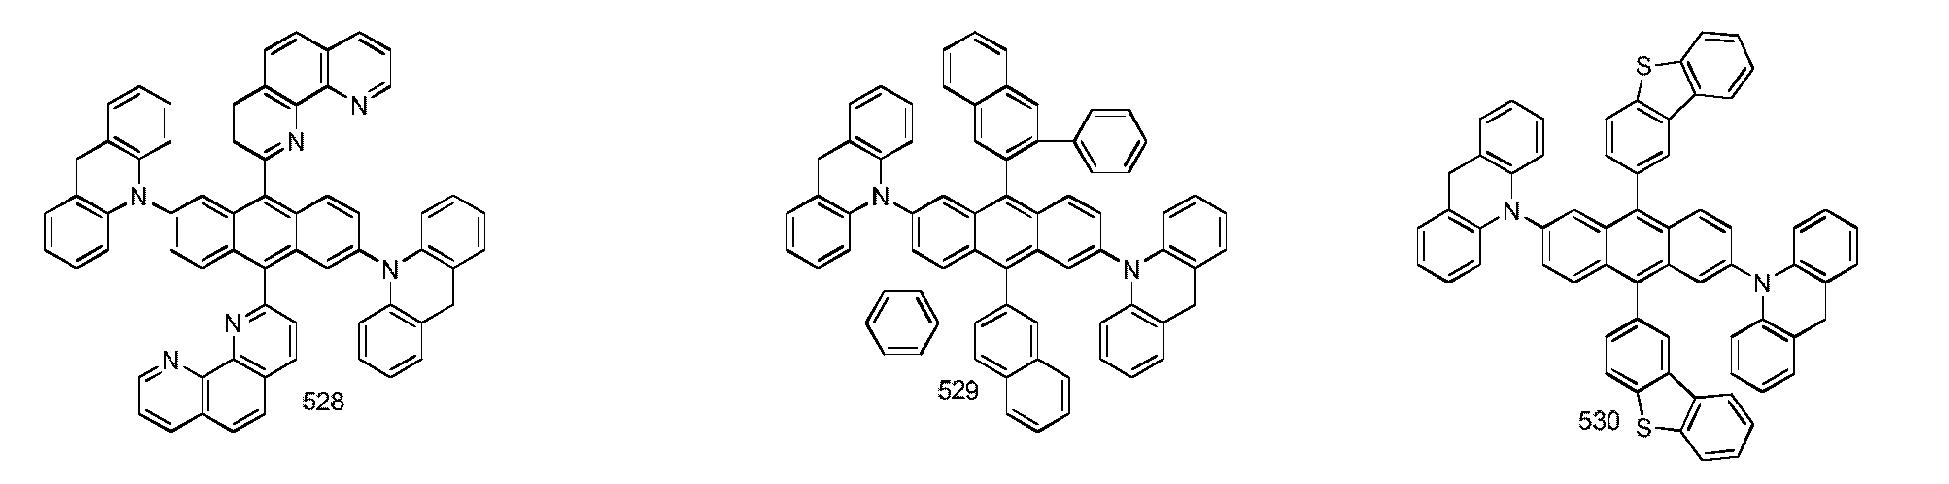 Figure imgb0026